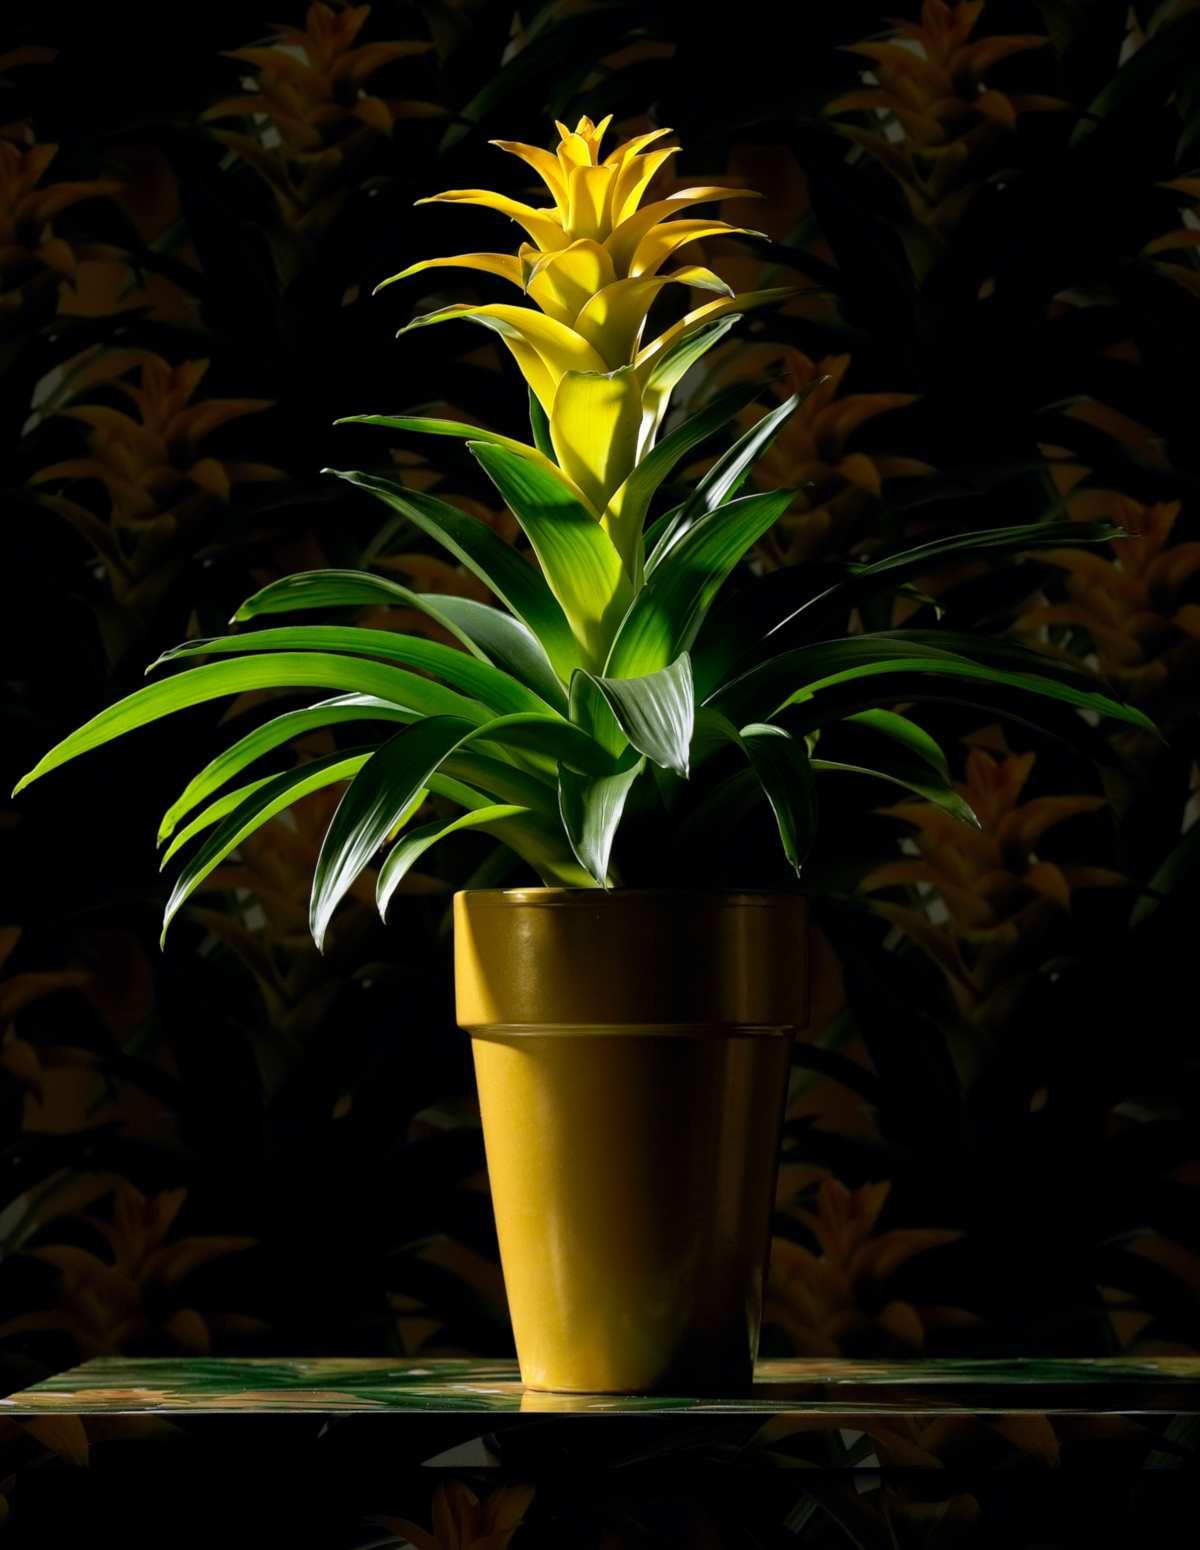 Yellow guzmania